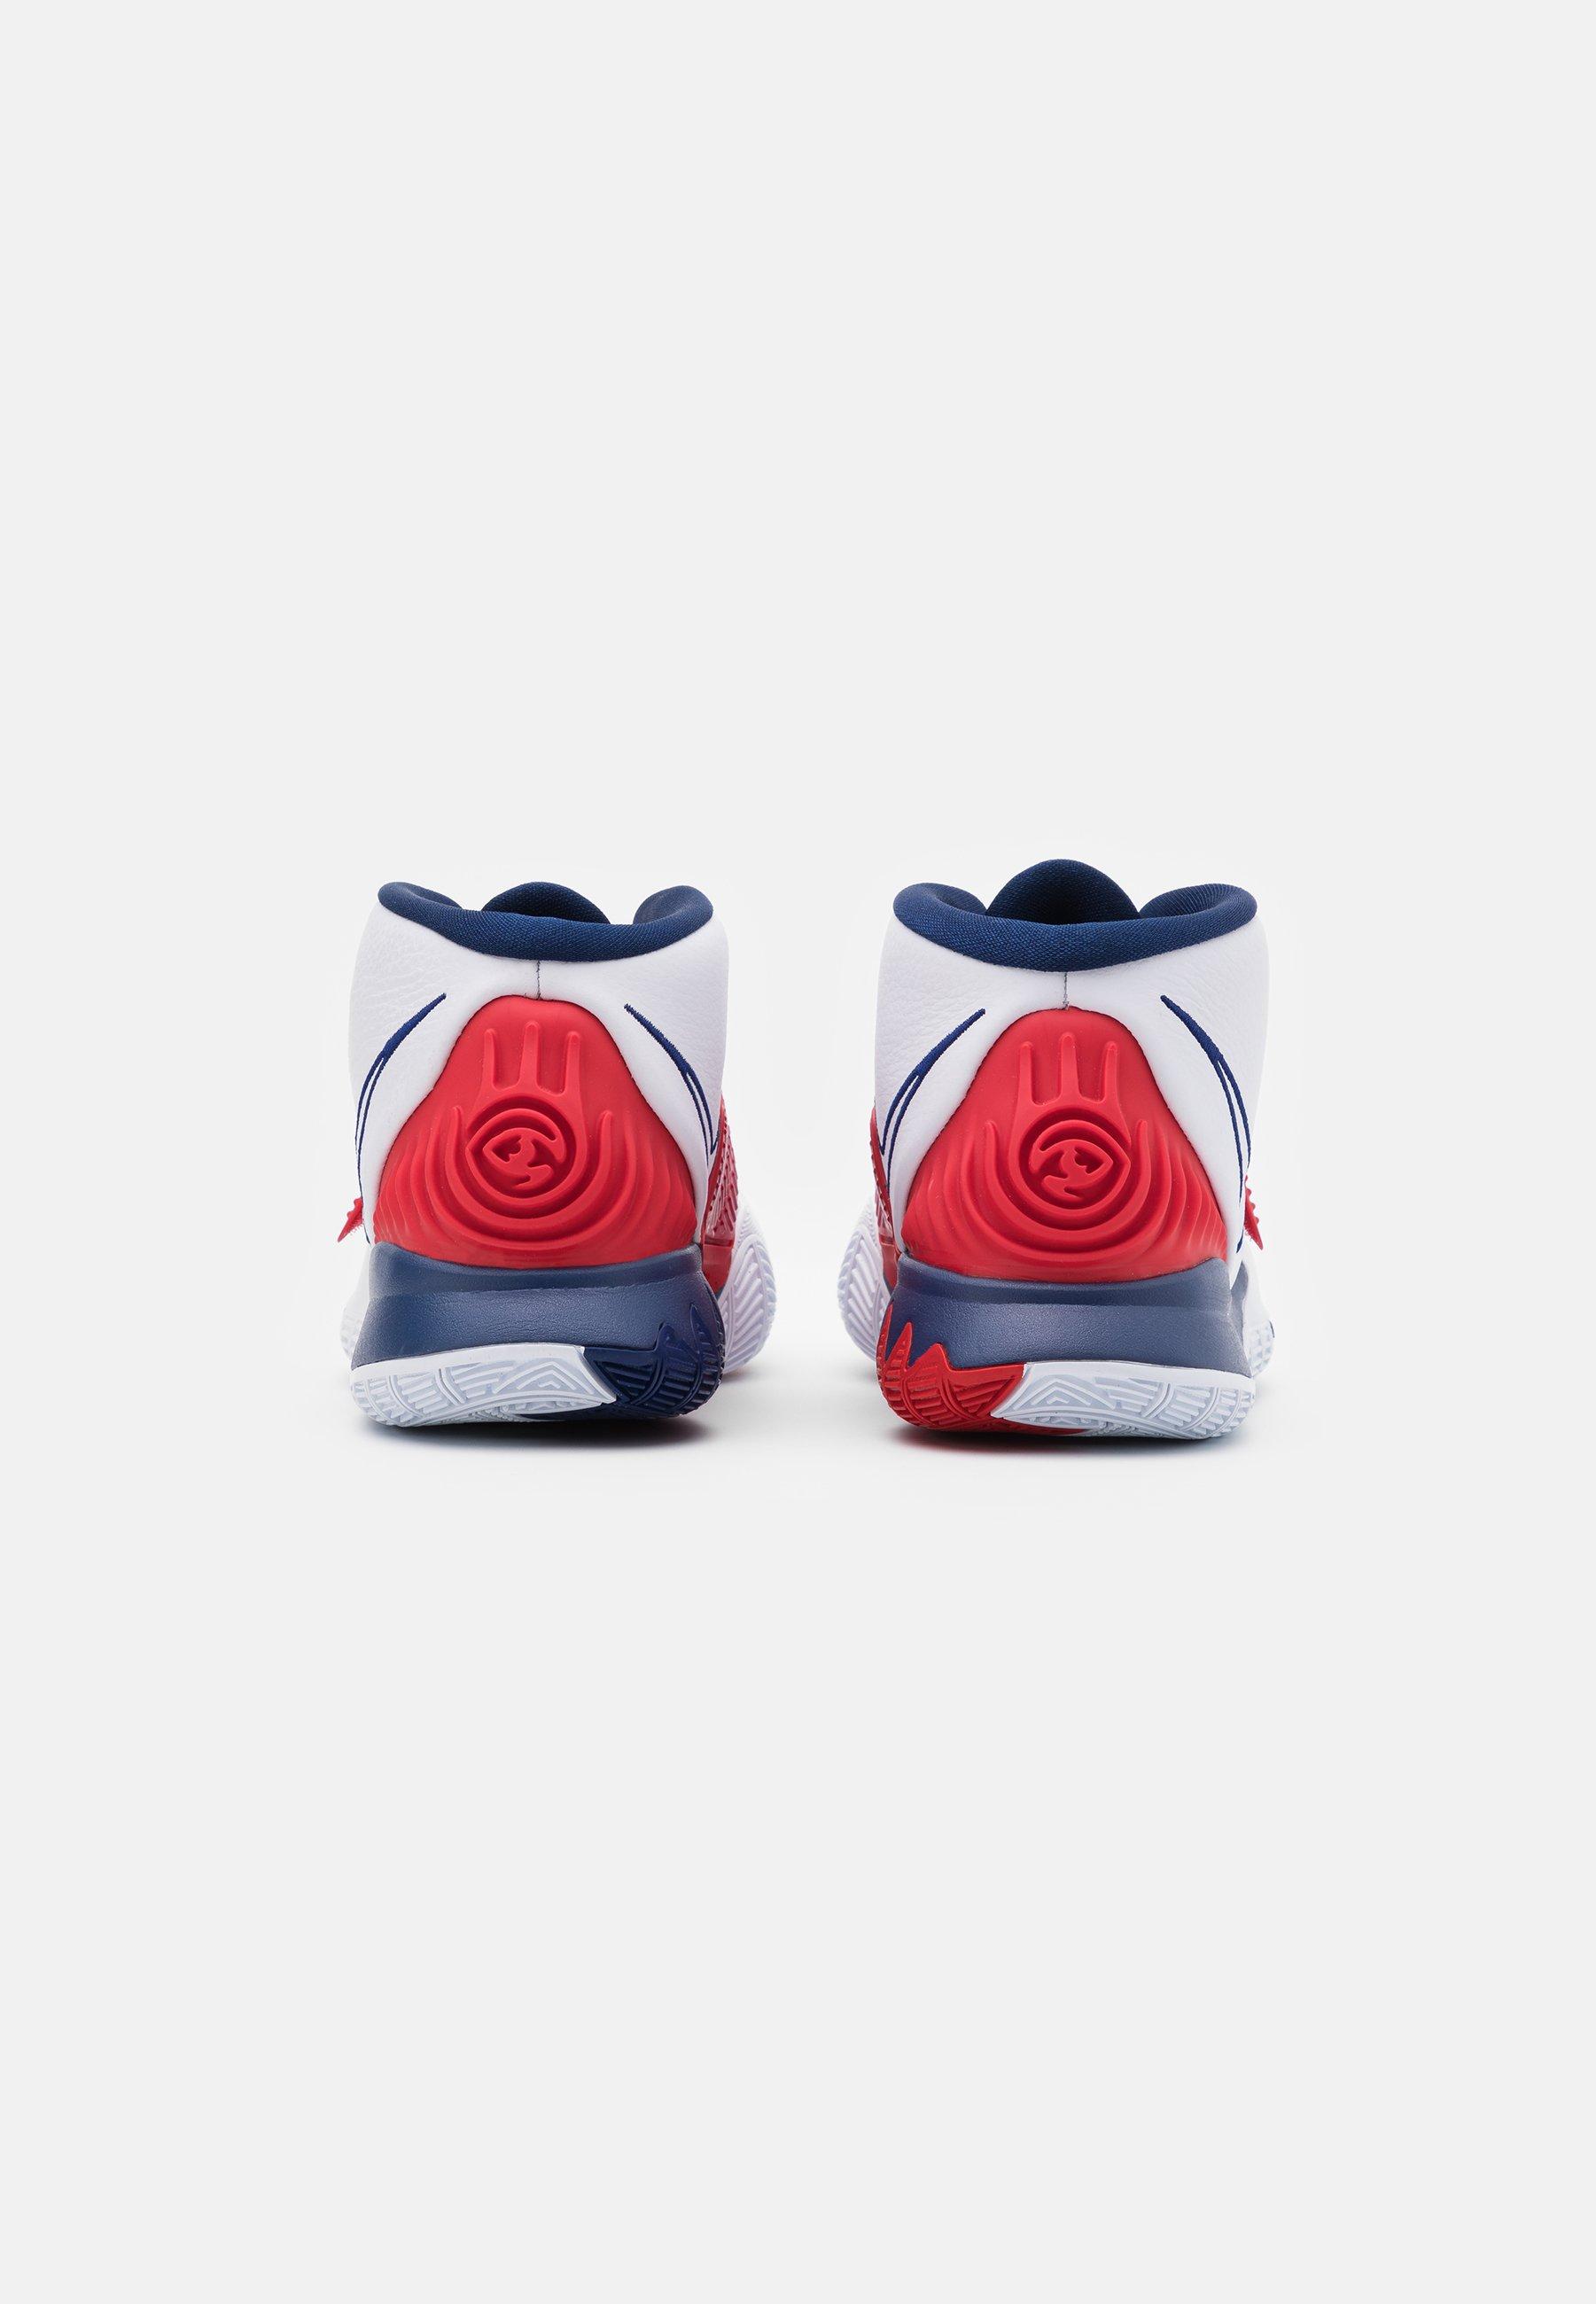 KYRIE 6 Chaussures de basket white